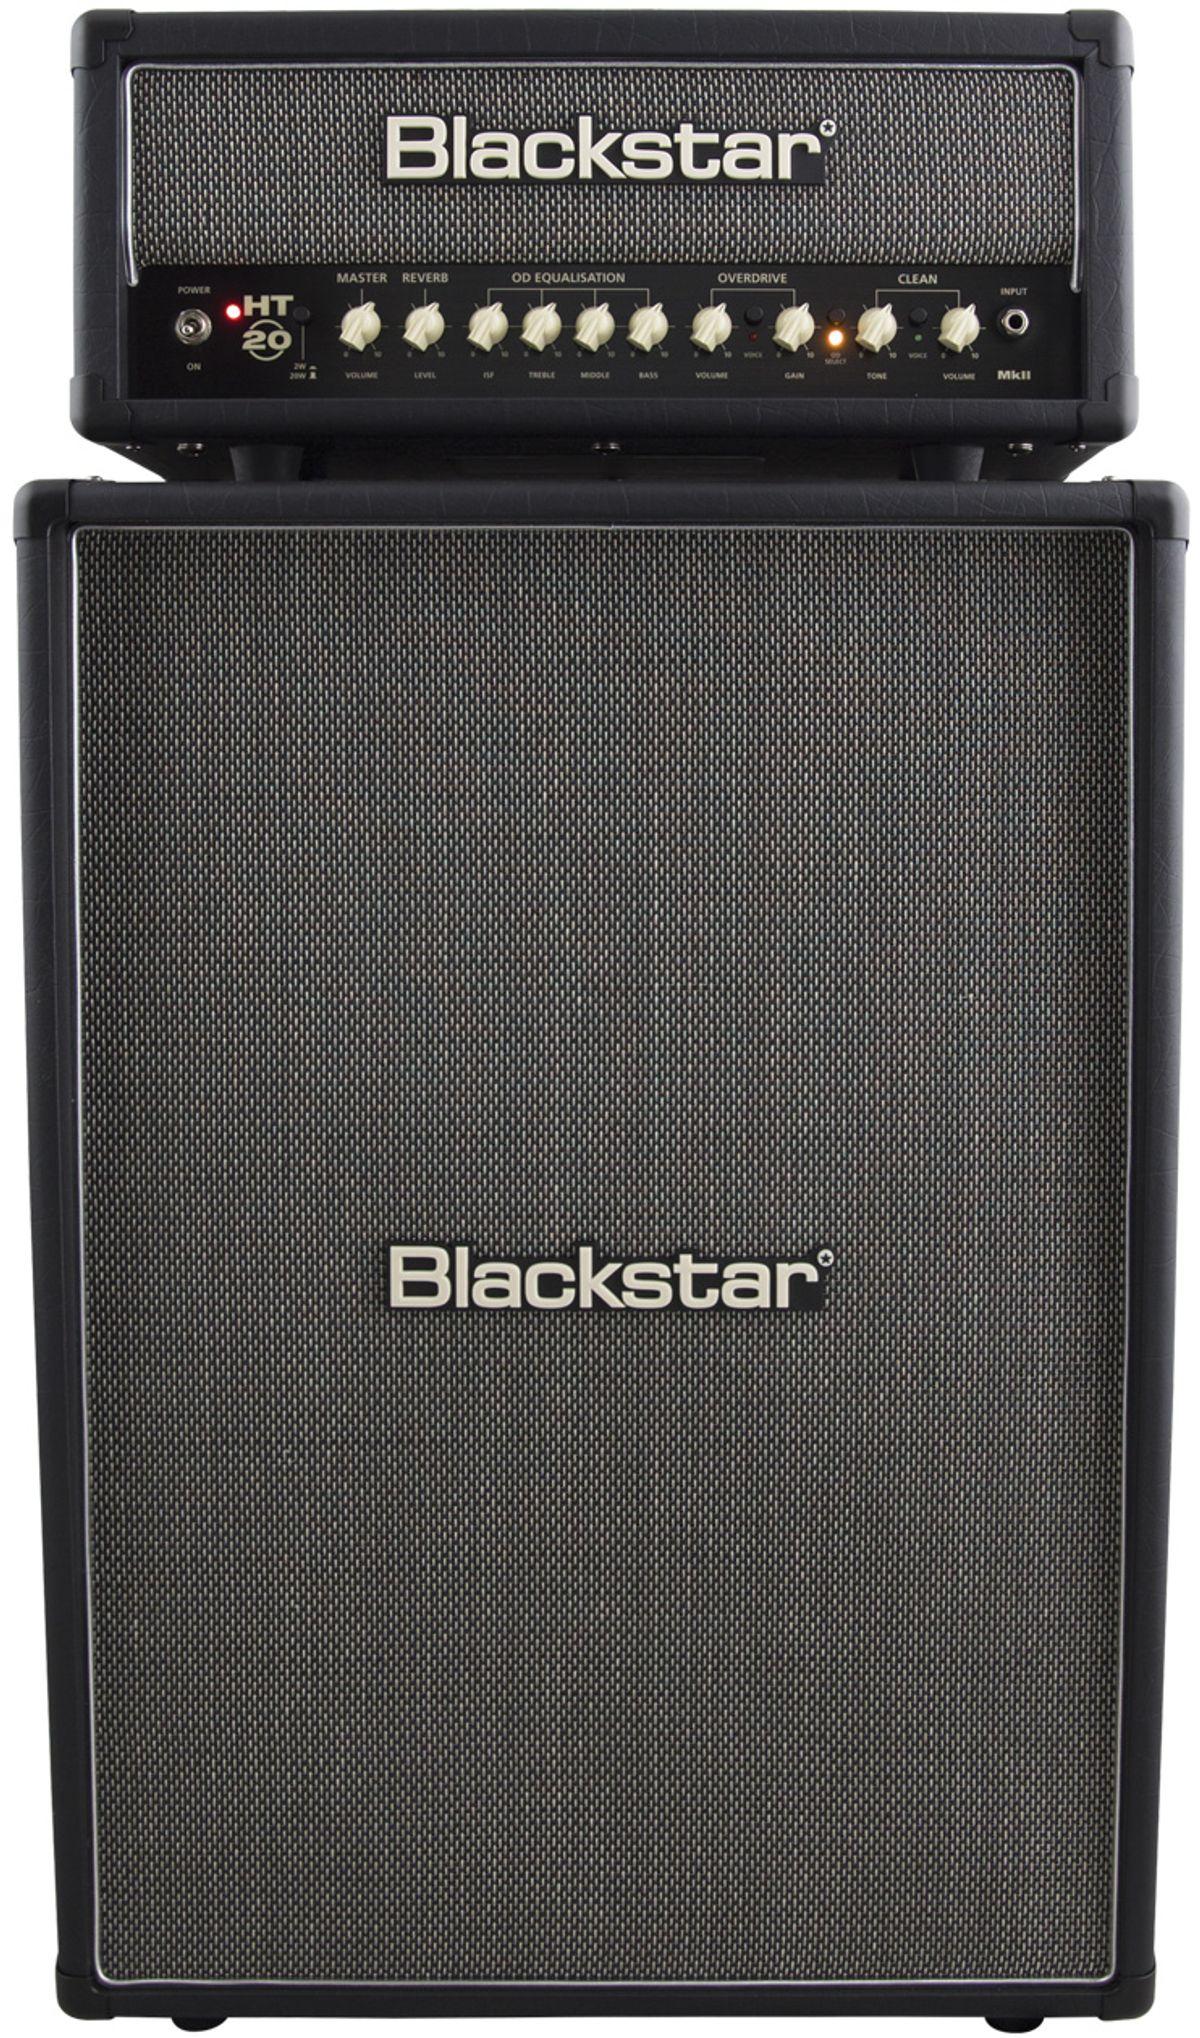 Blackstar HT20RH MkII Review